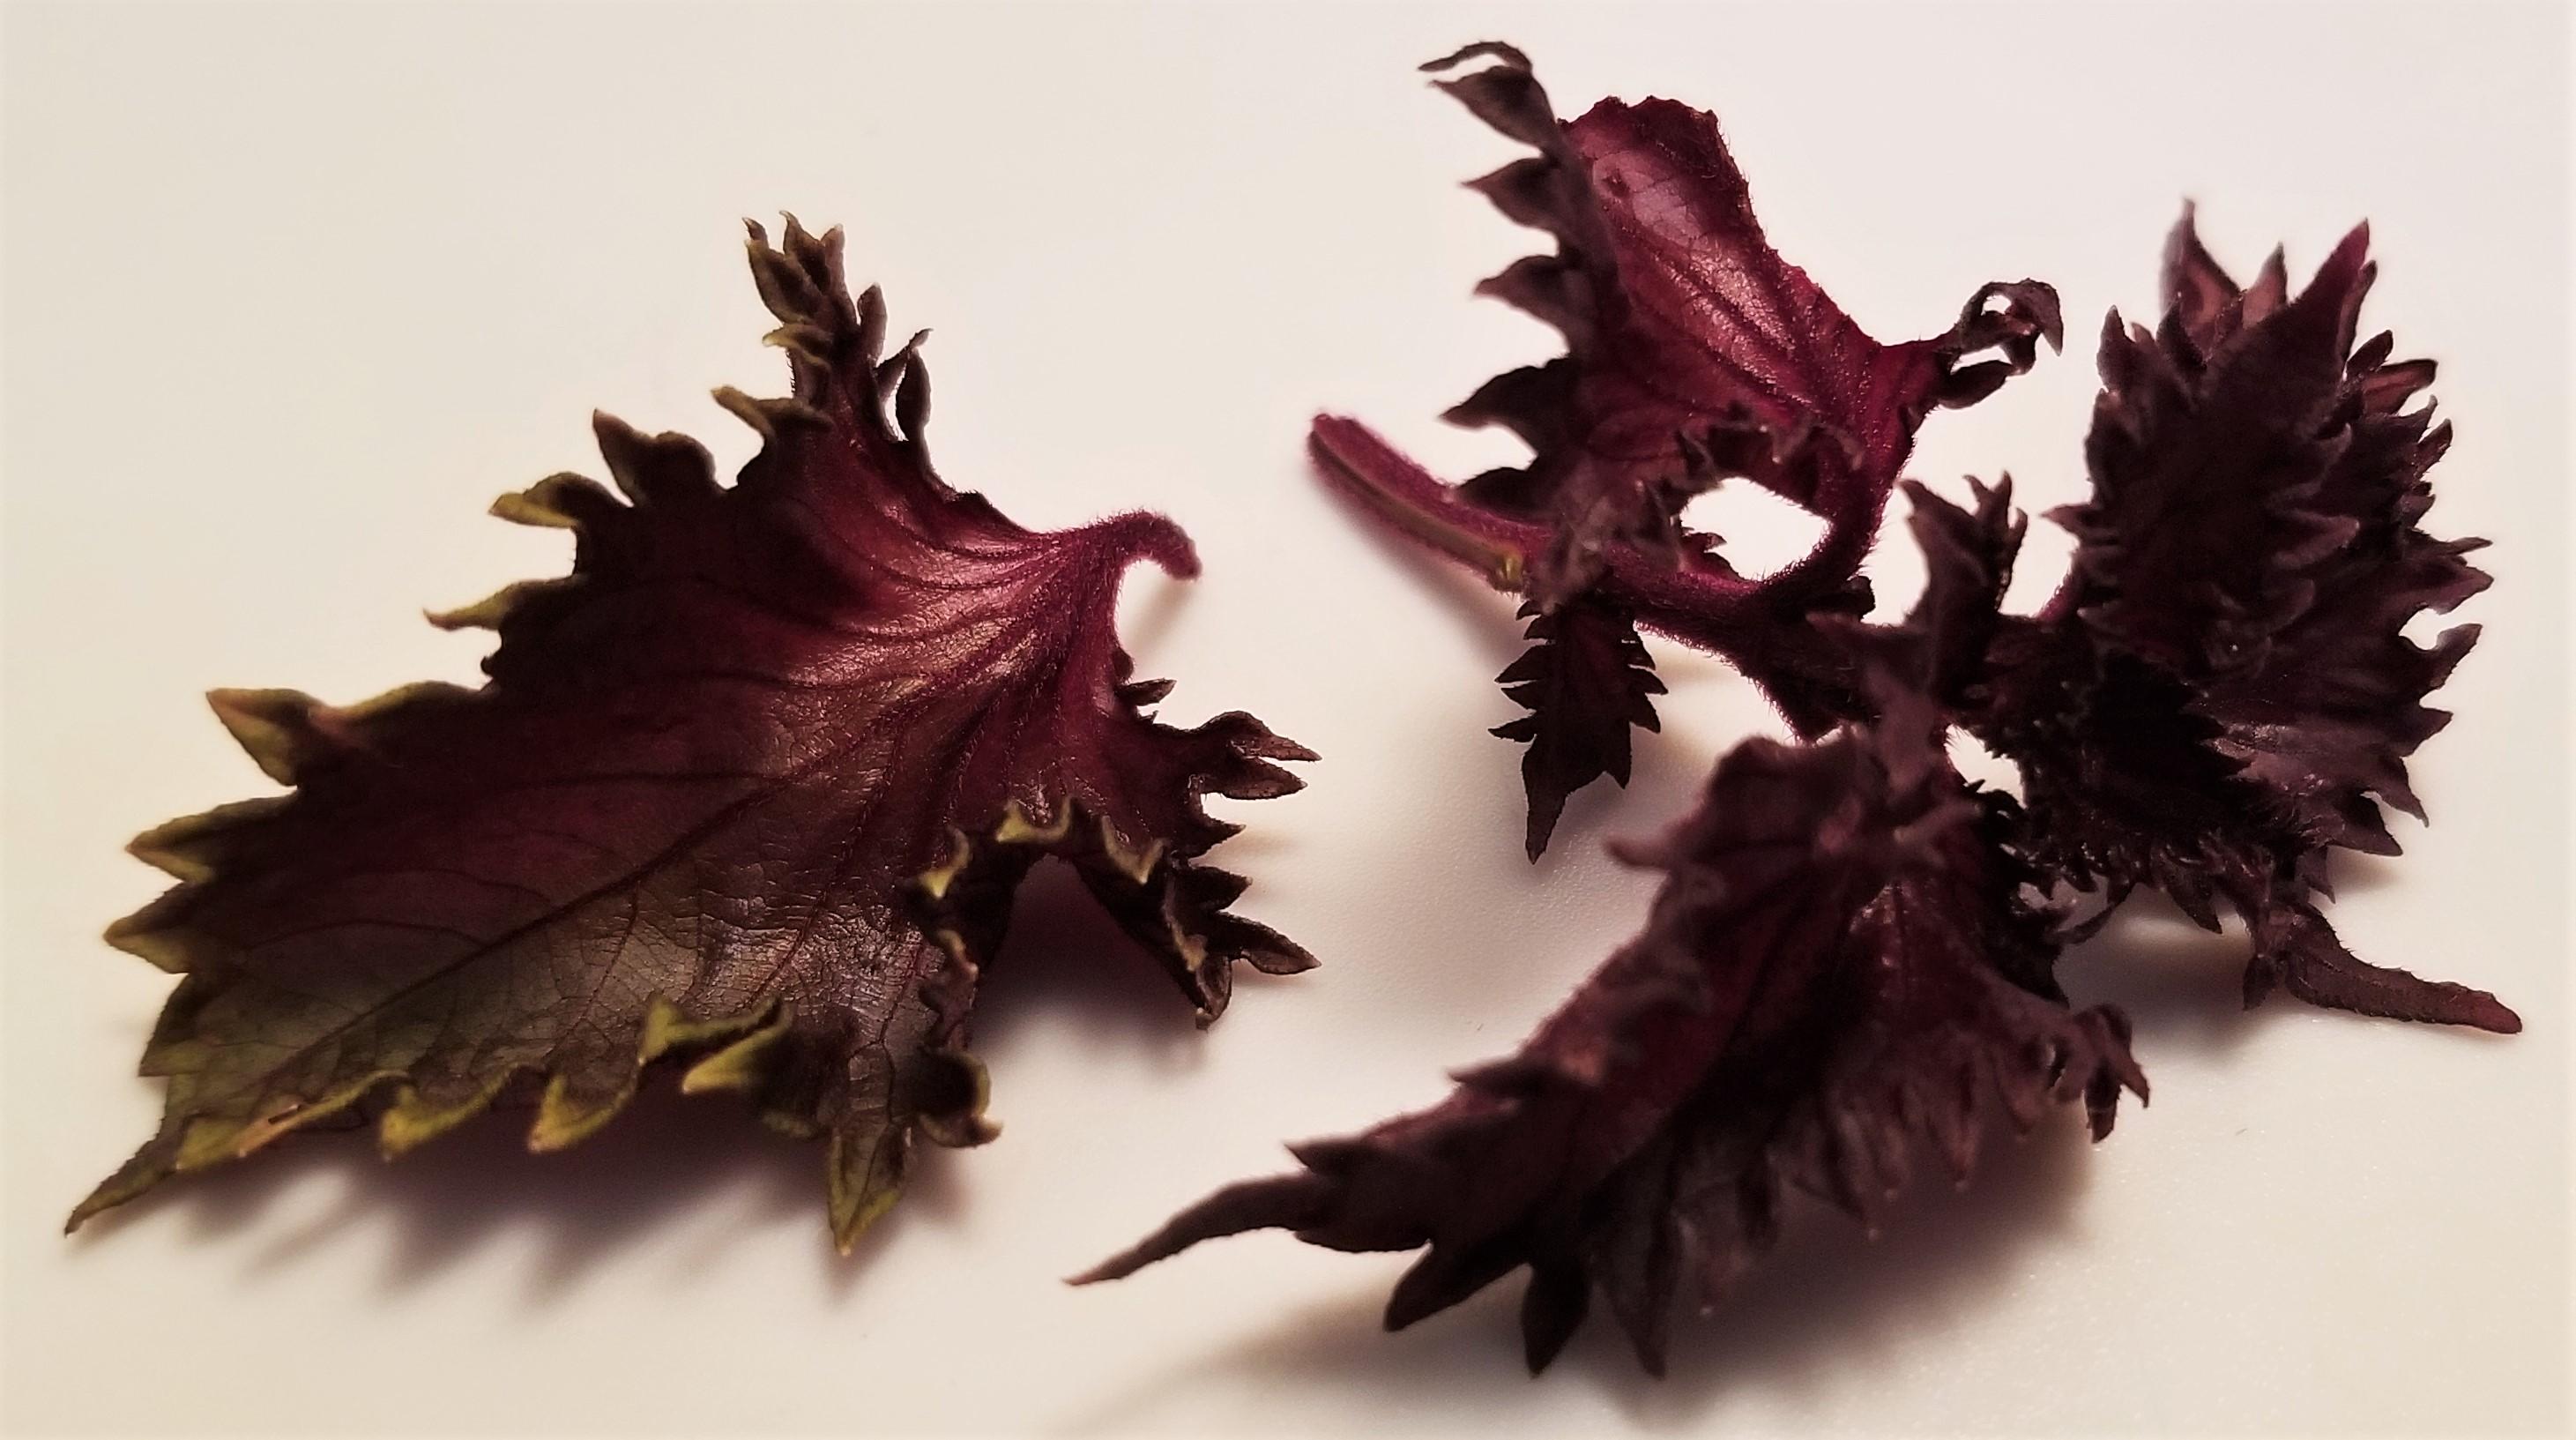 001 Red Perilla leaves